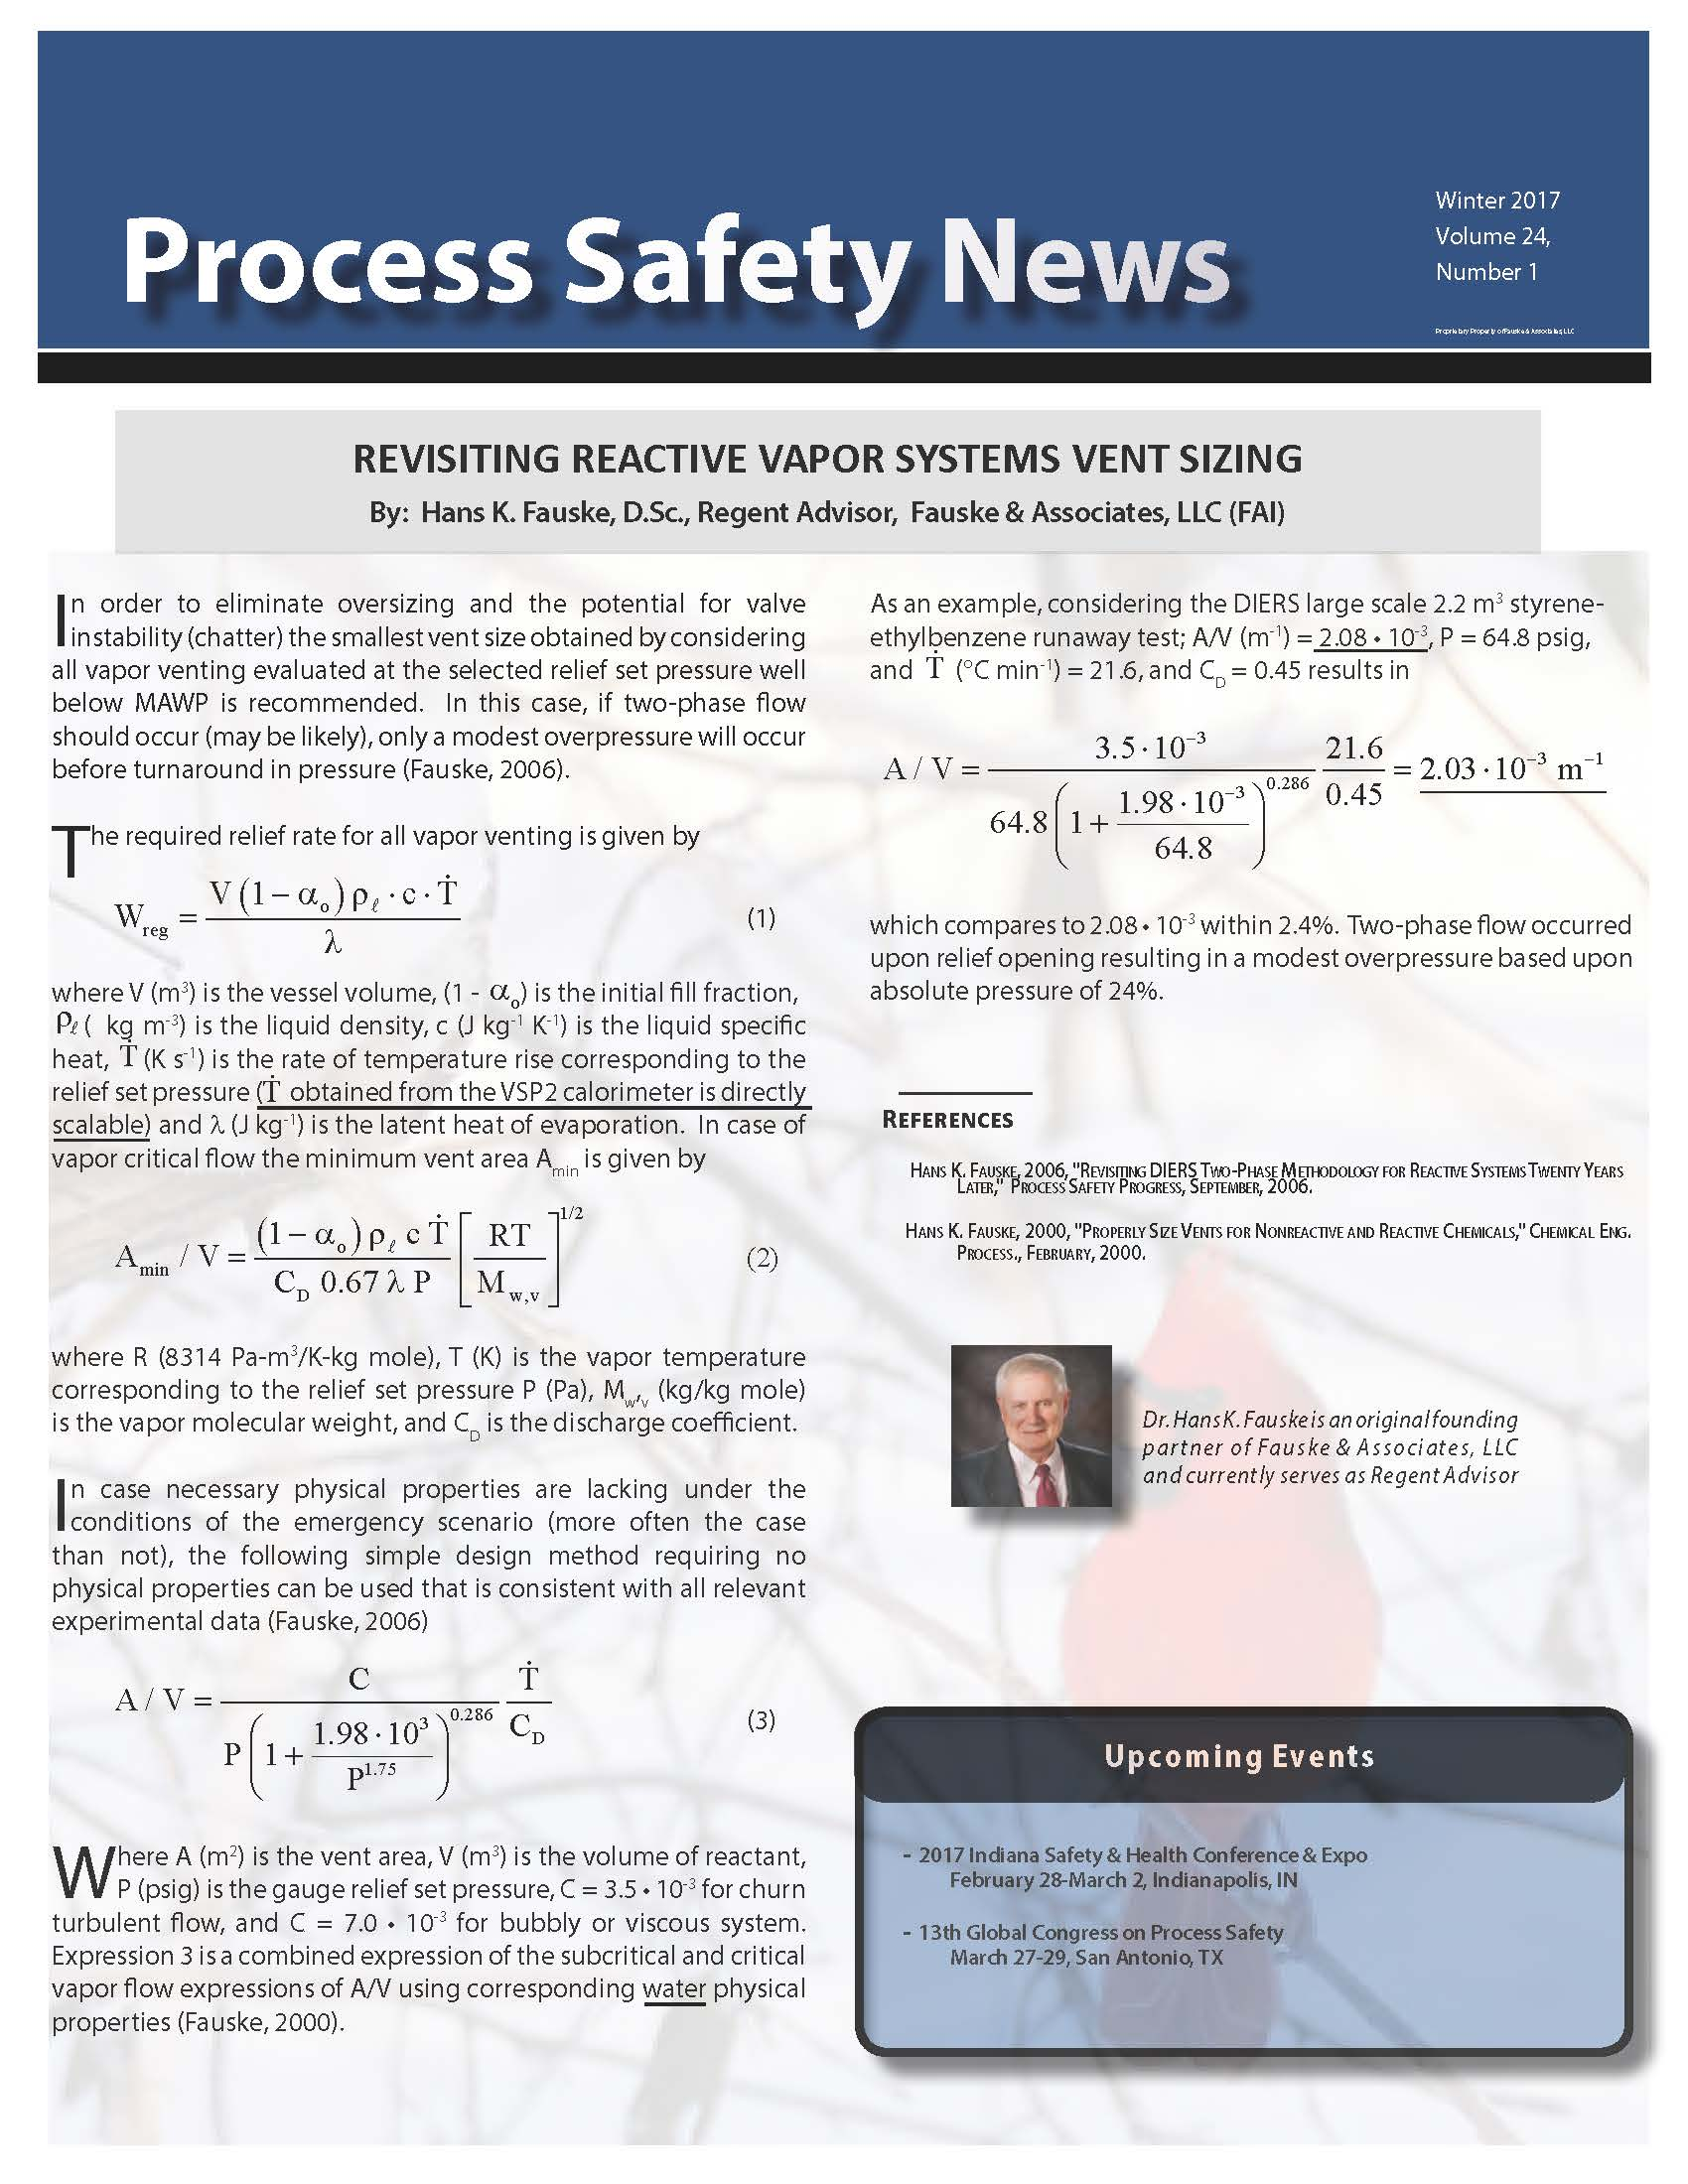 Winter 2017 Process Safety News web_Page_01.jpg